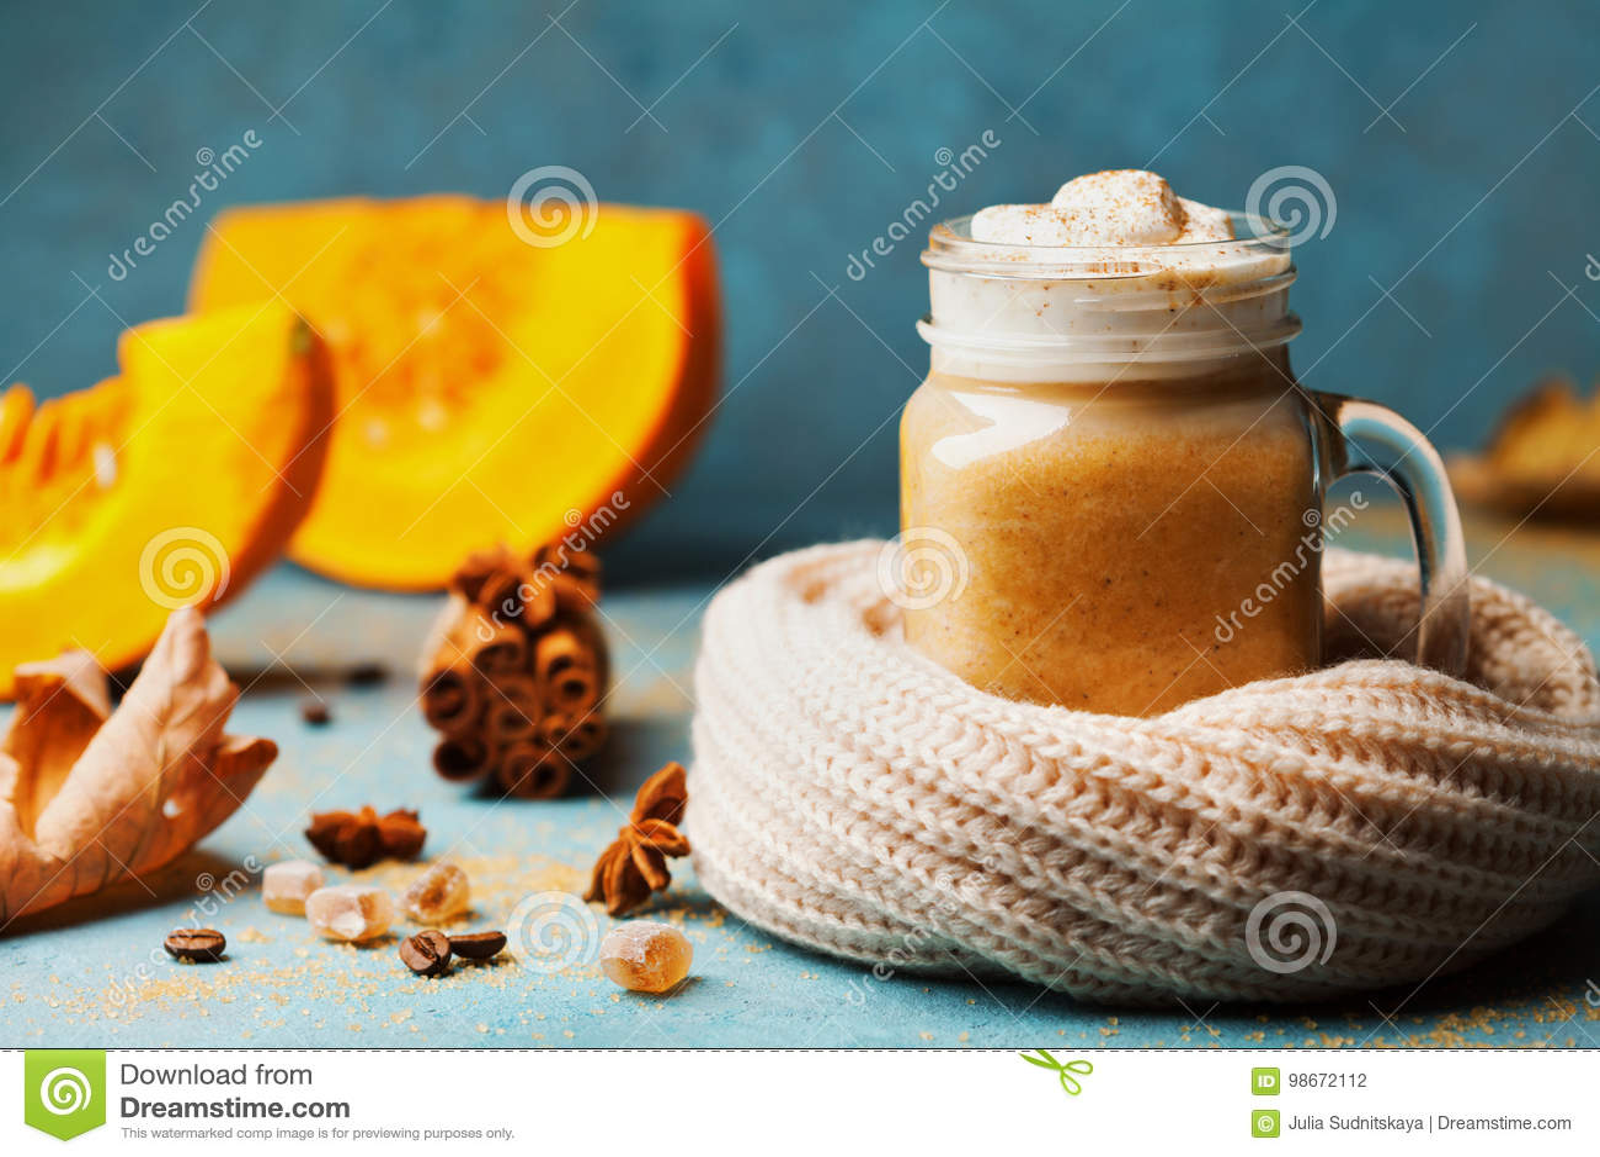 De pompoen kruidde latte of de koffie in glas verfraaide gebreide sjaal op turkooise uitstekende achtergrond De herfst, dalings o